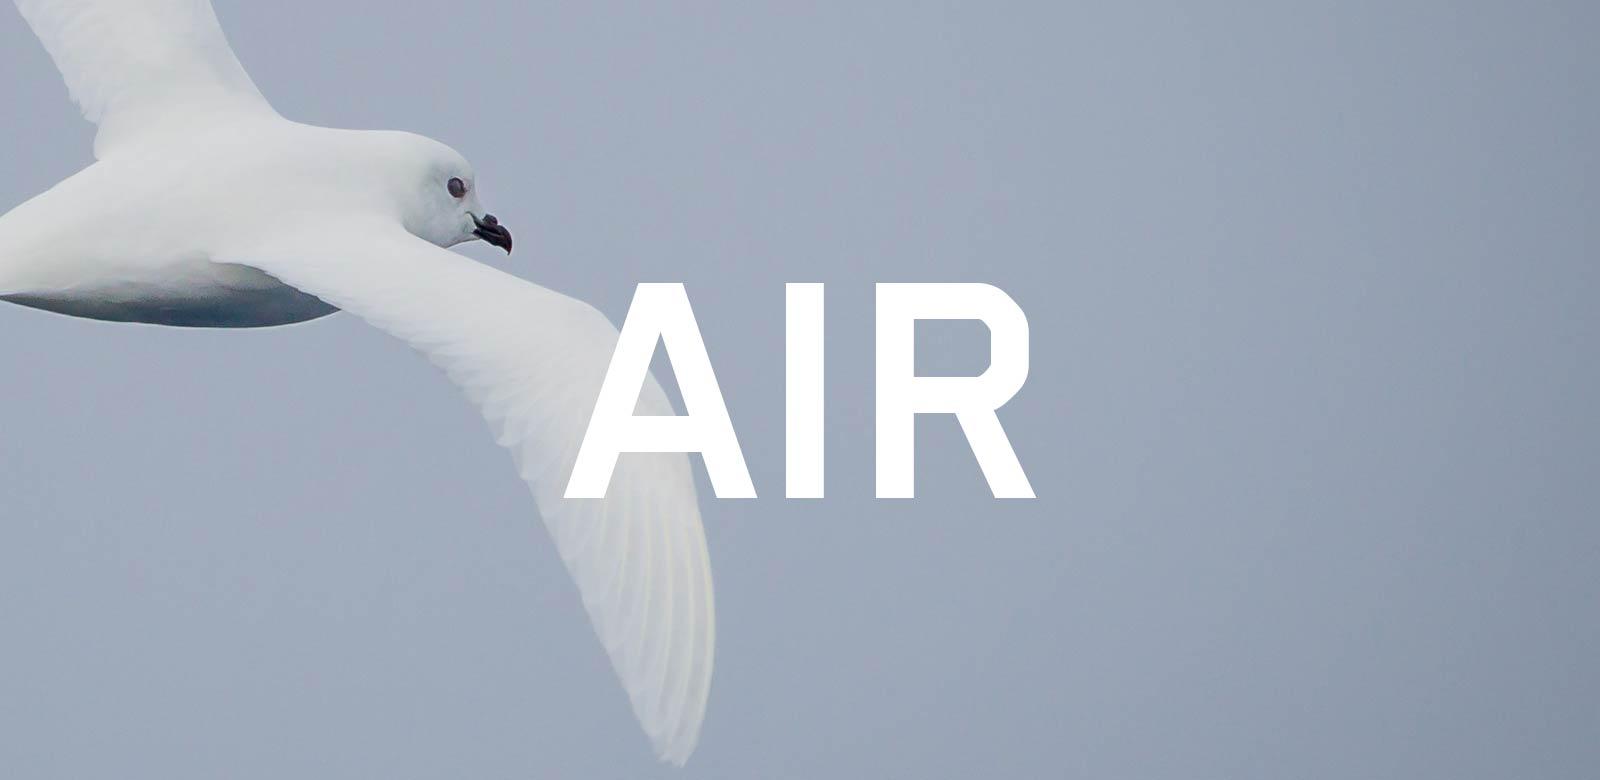 Under Pressure - Air